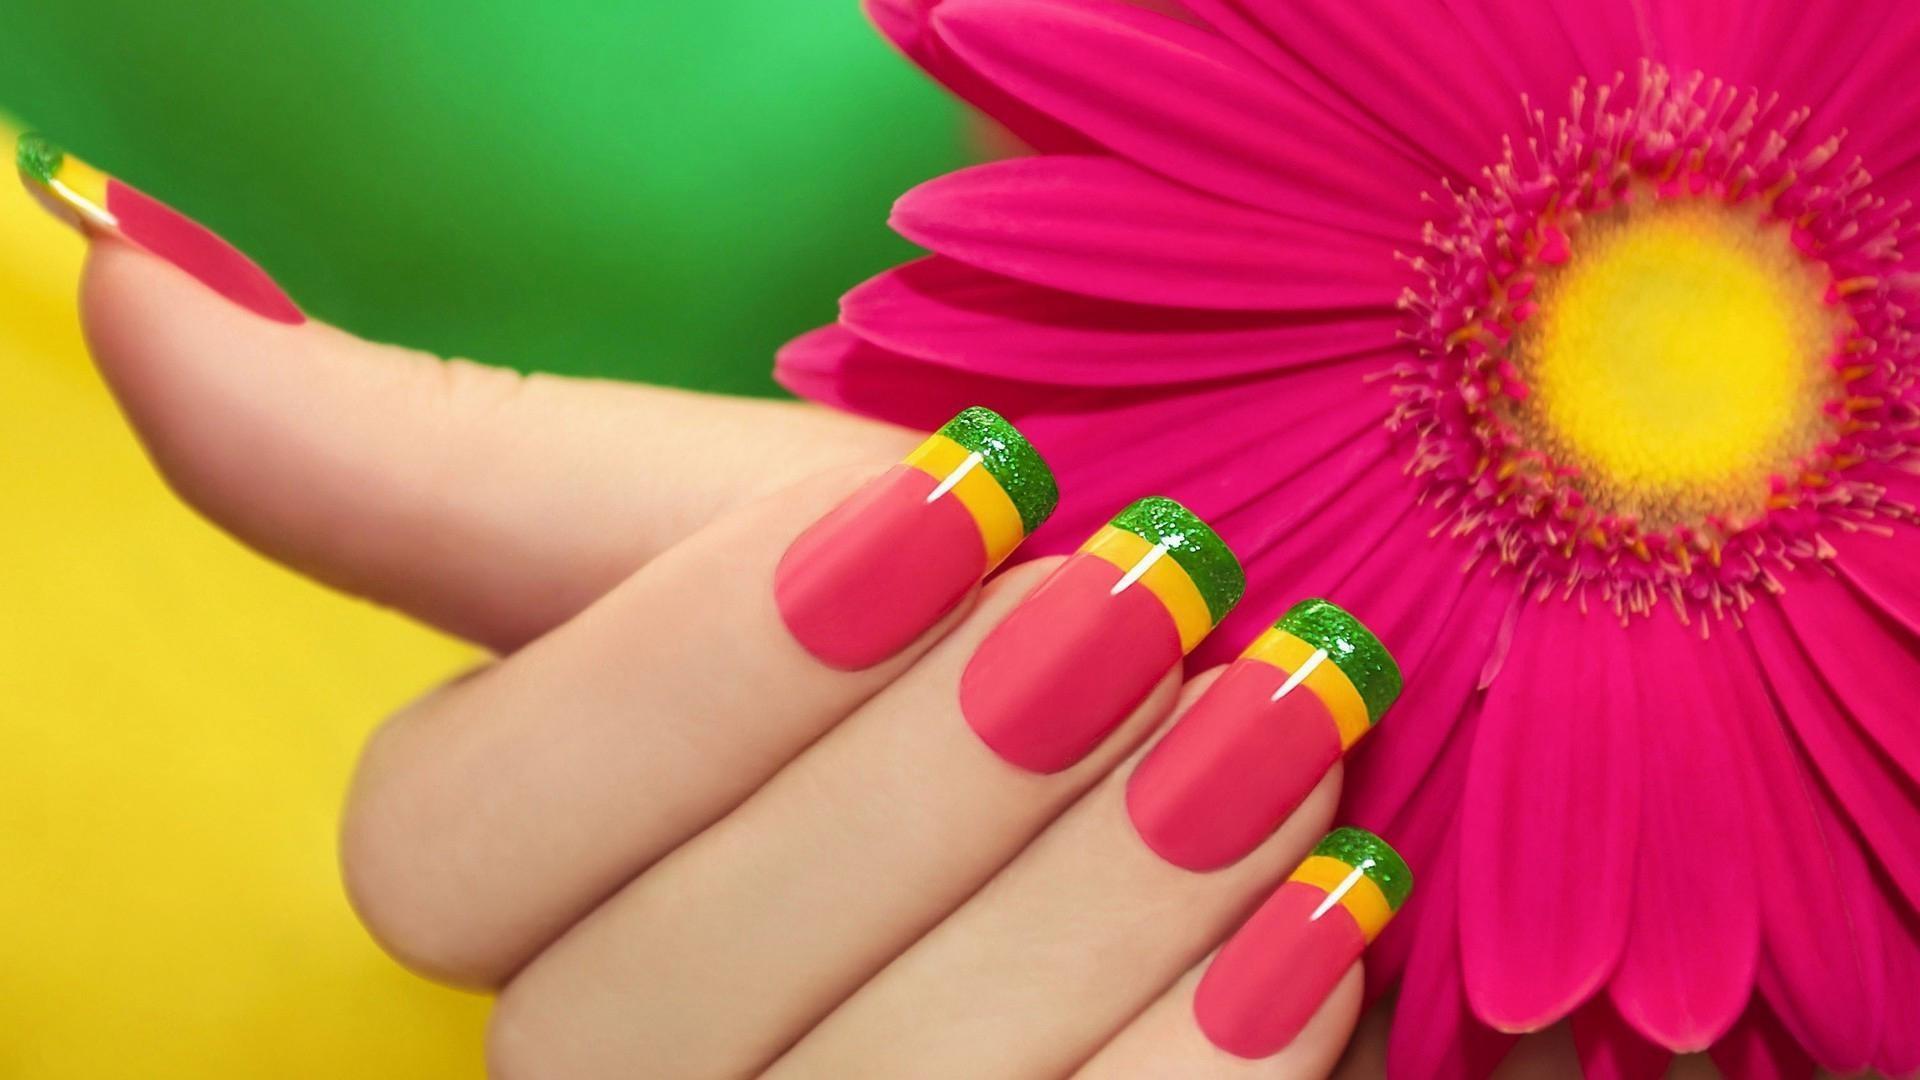 Nails Wallpaper (58+ Images